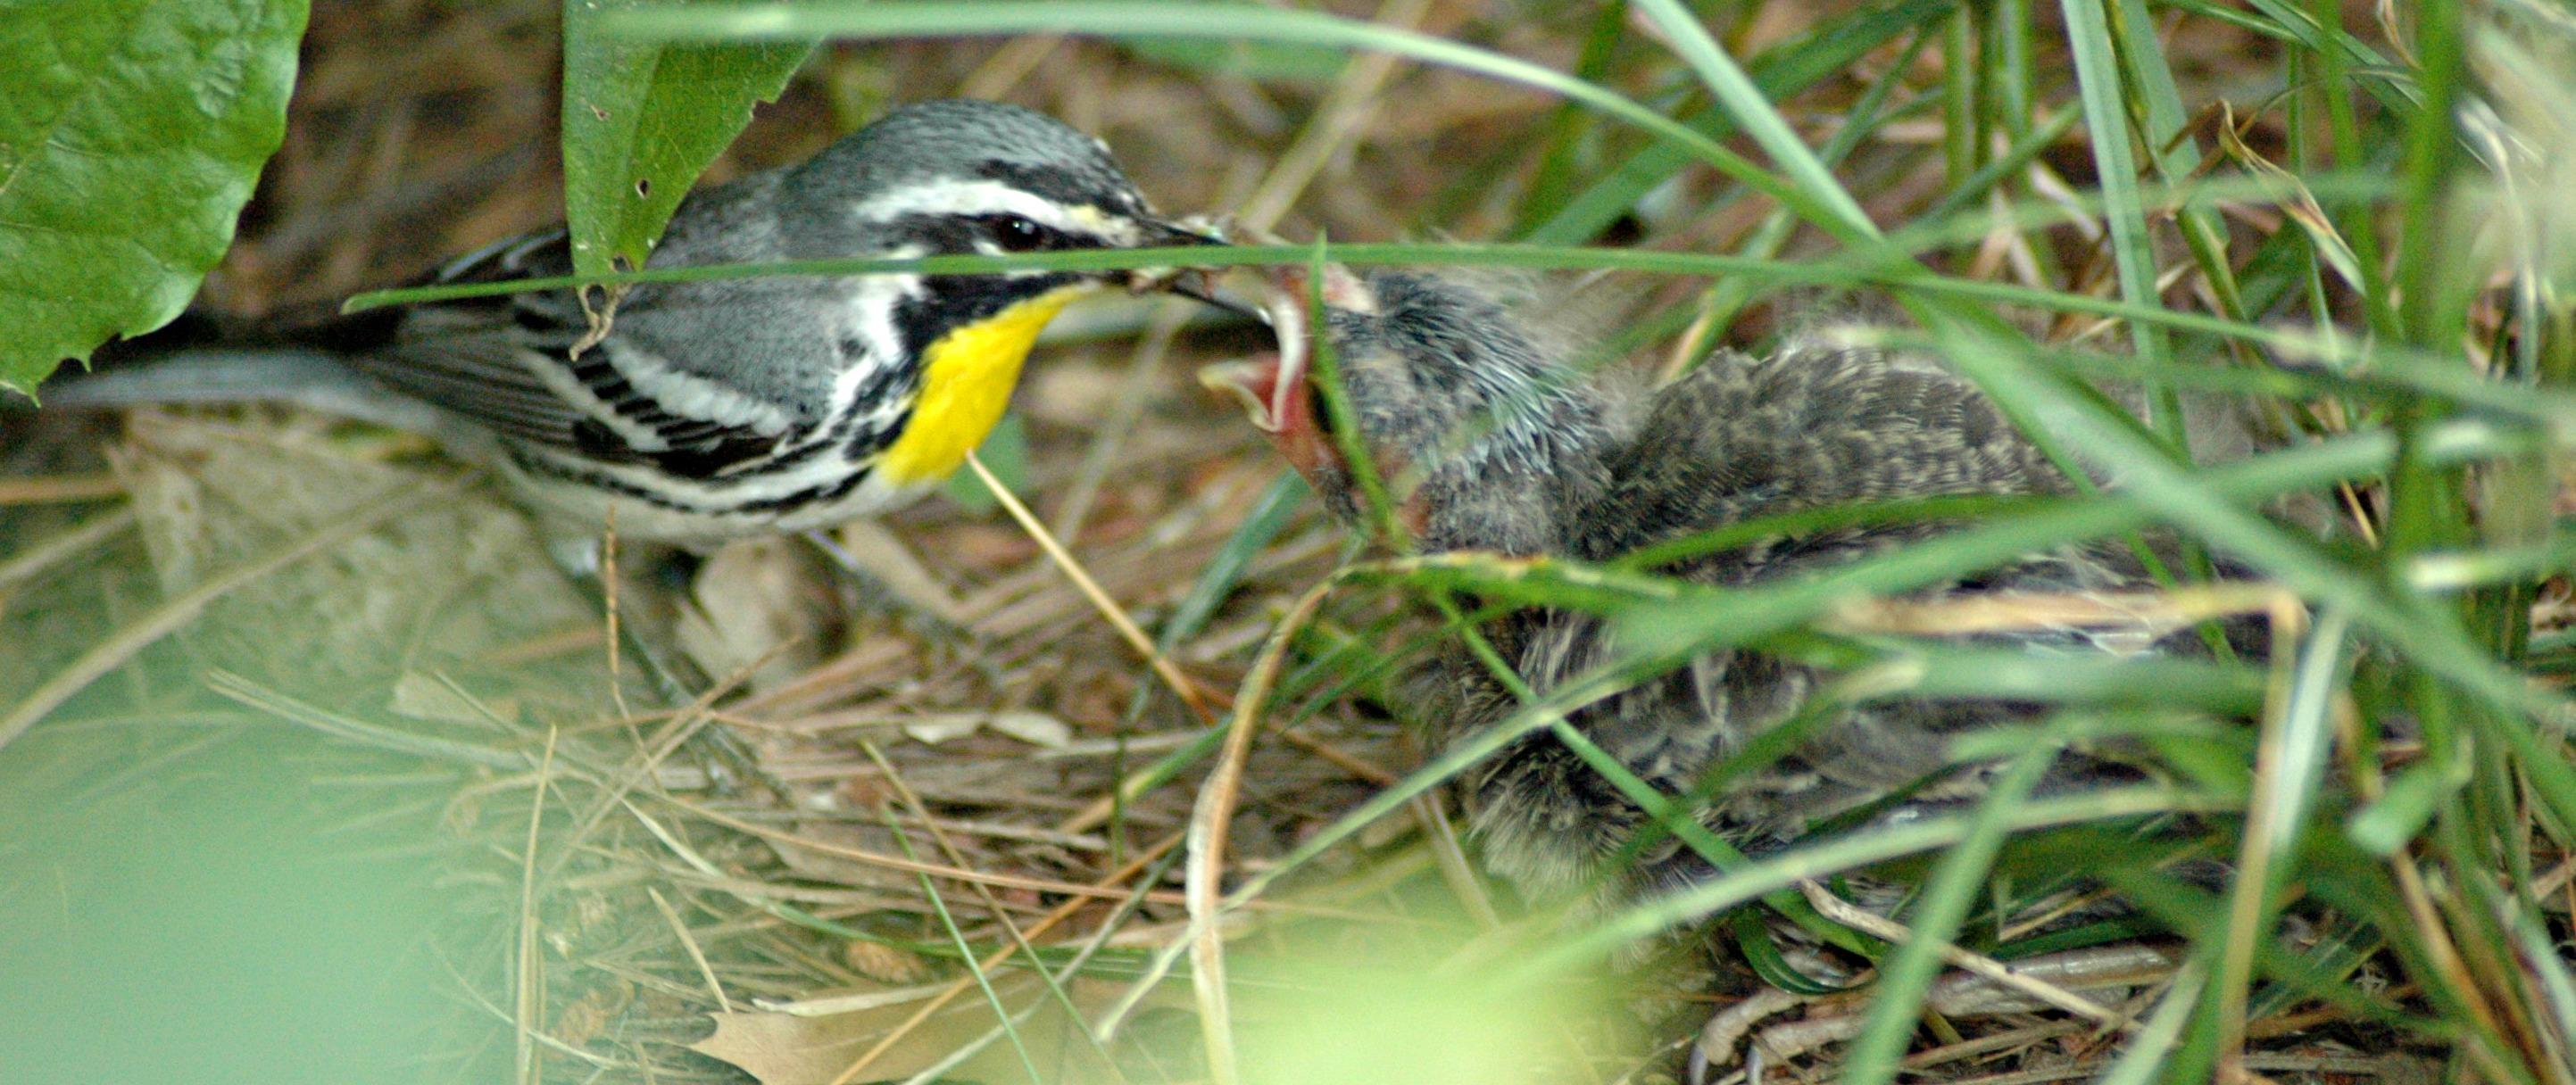 warbler feeding a cowbird - how to get rid of cowbirds